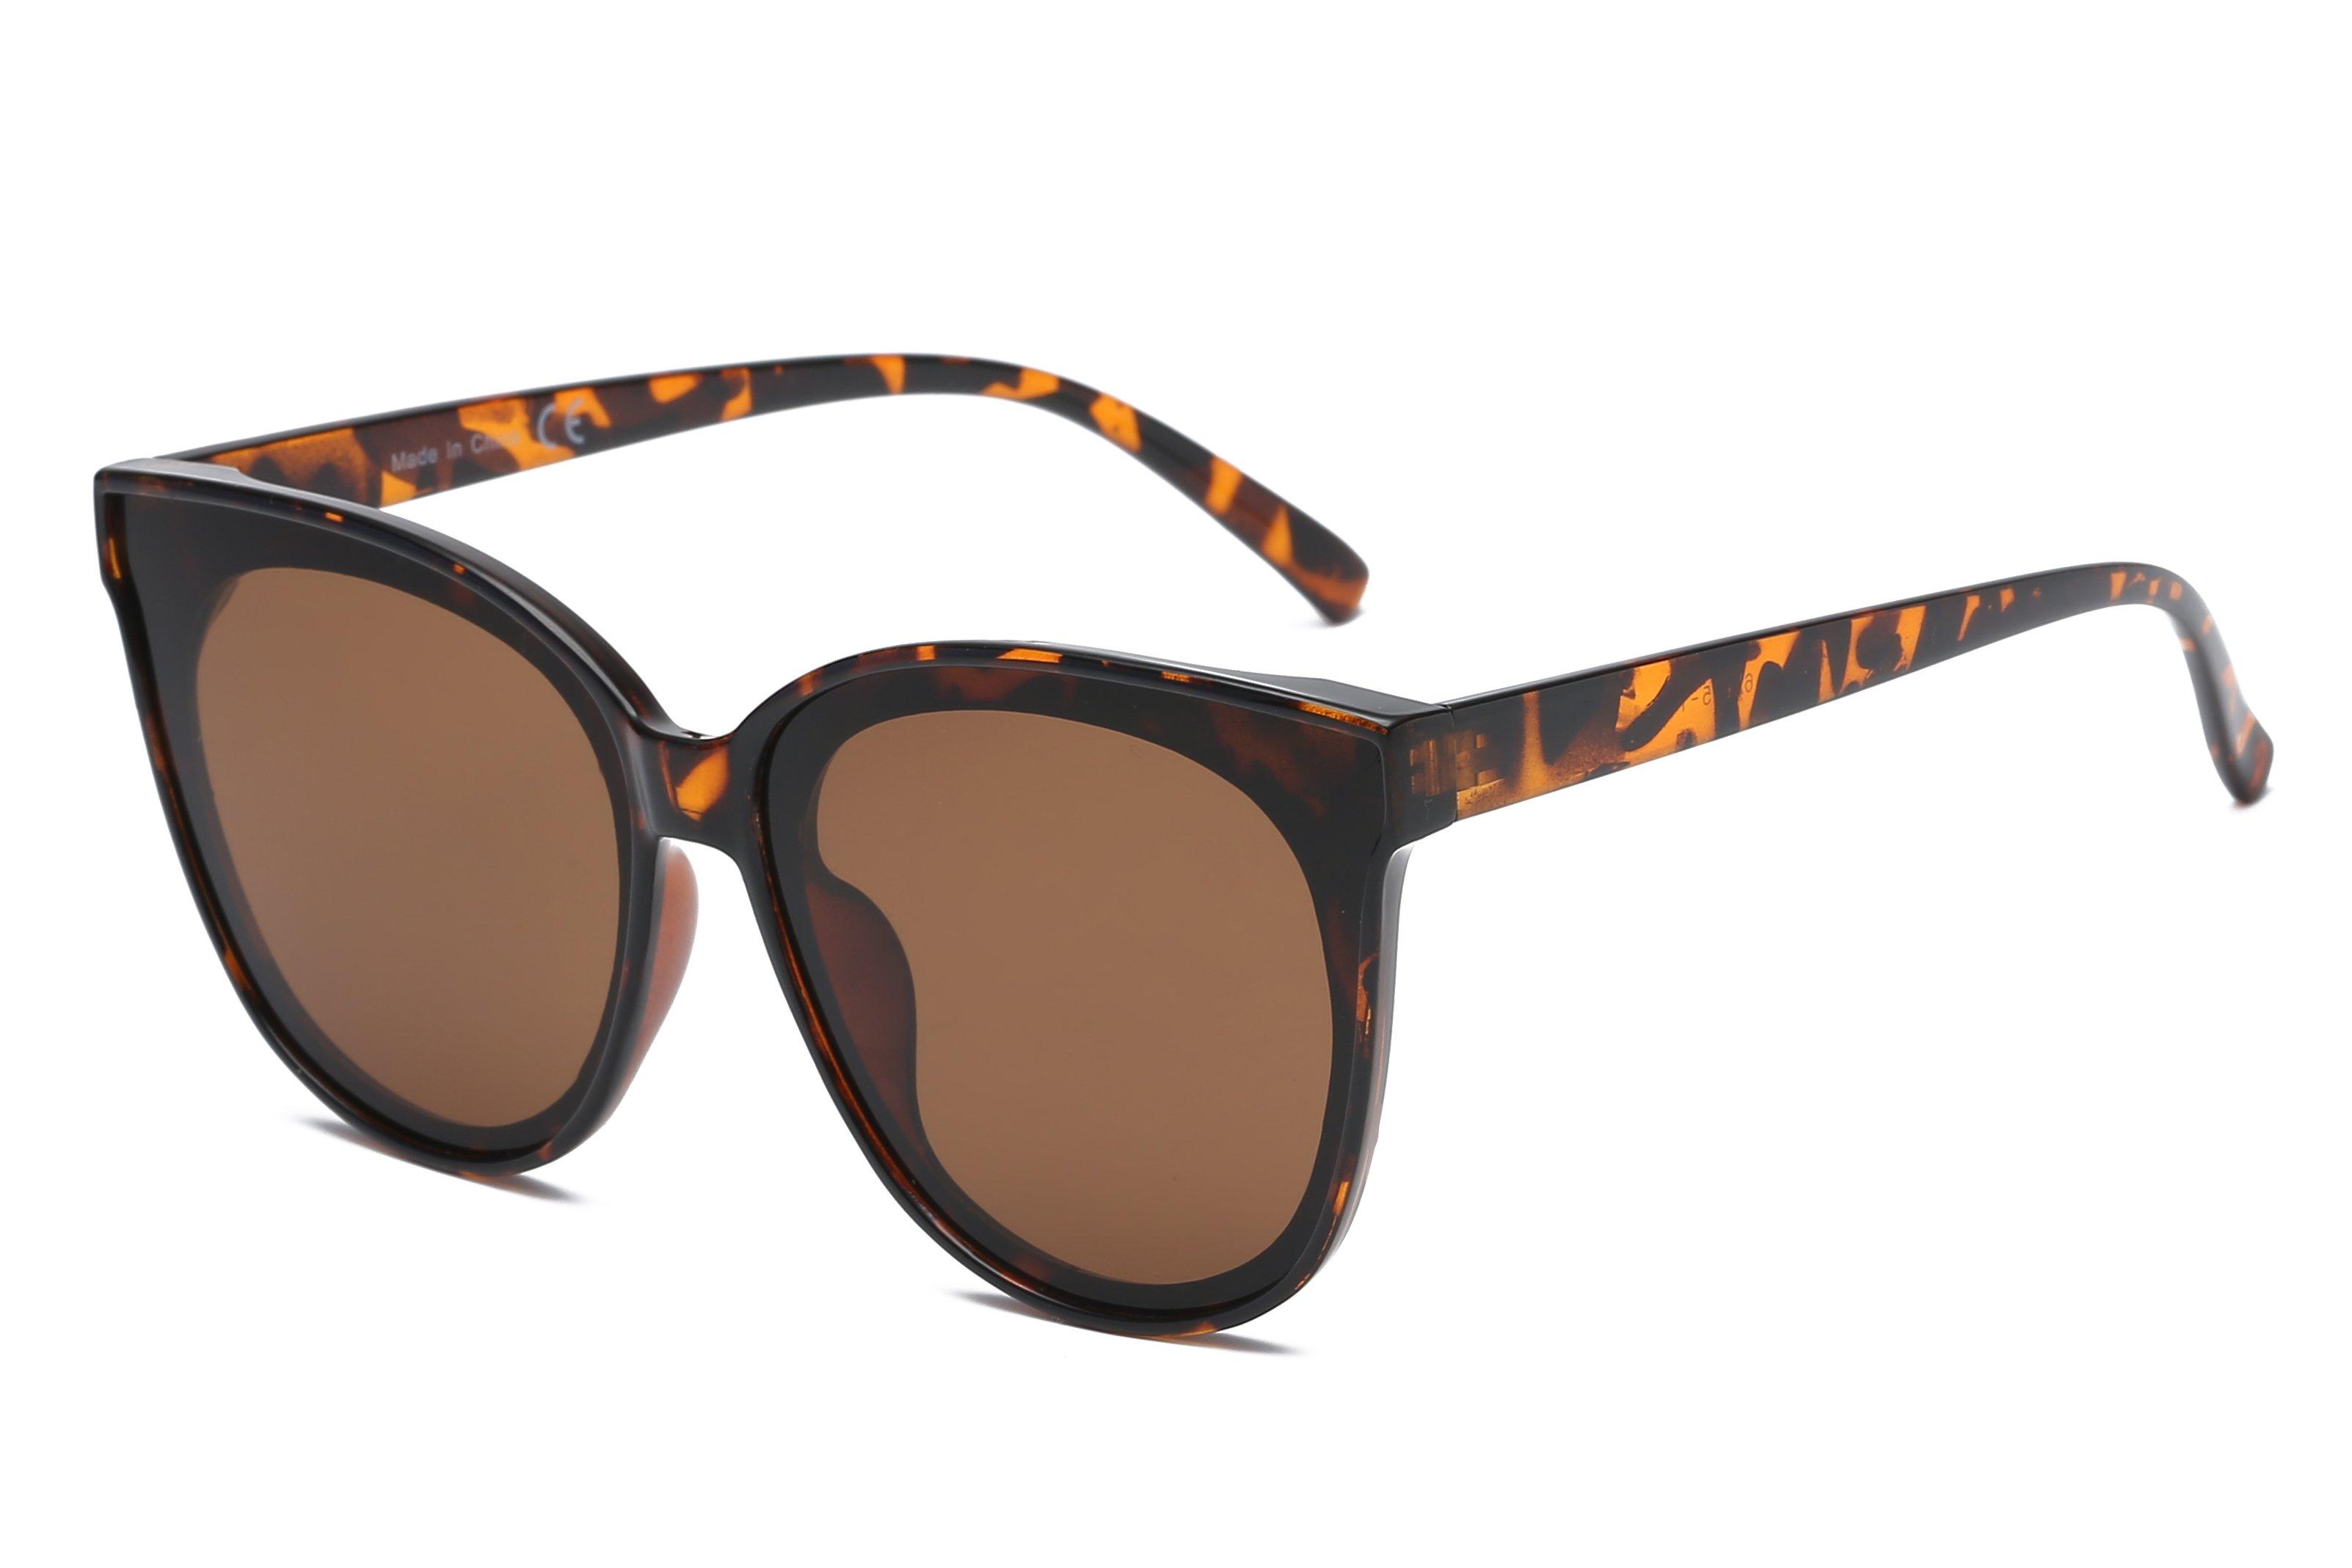 Round Cat-Eye Sunglasses -Tortoise - Front